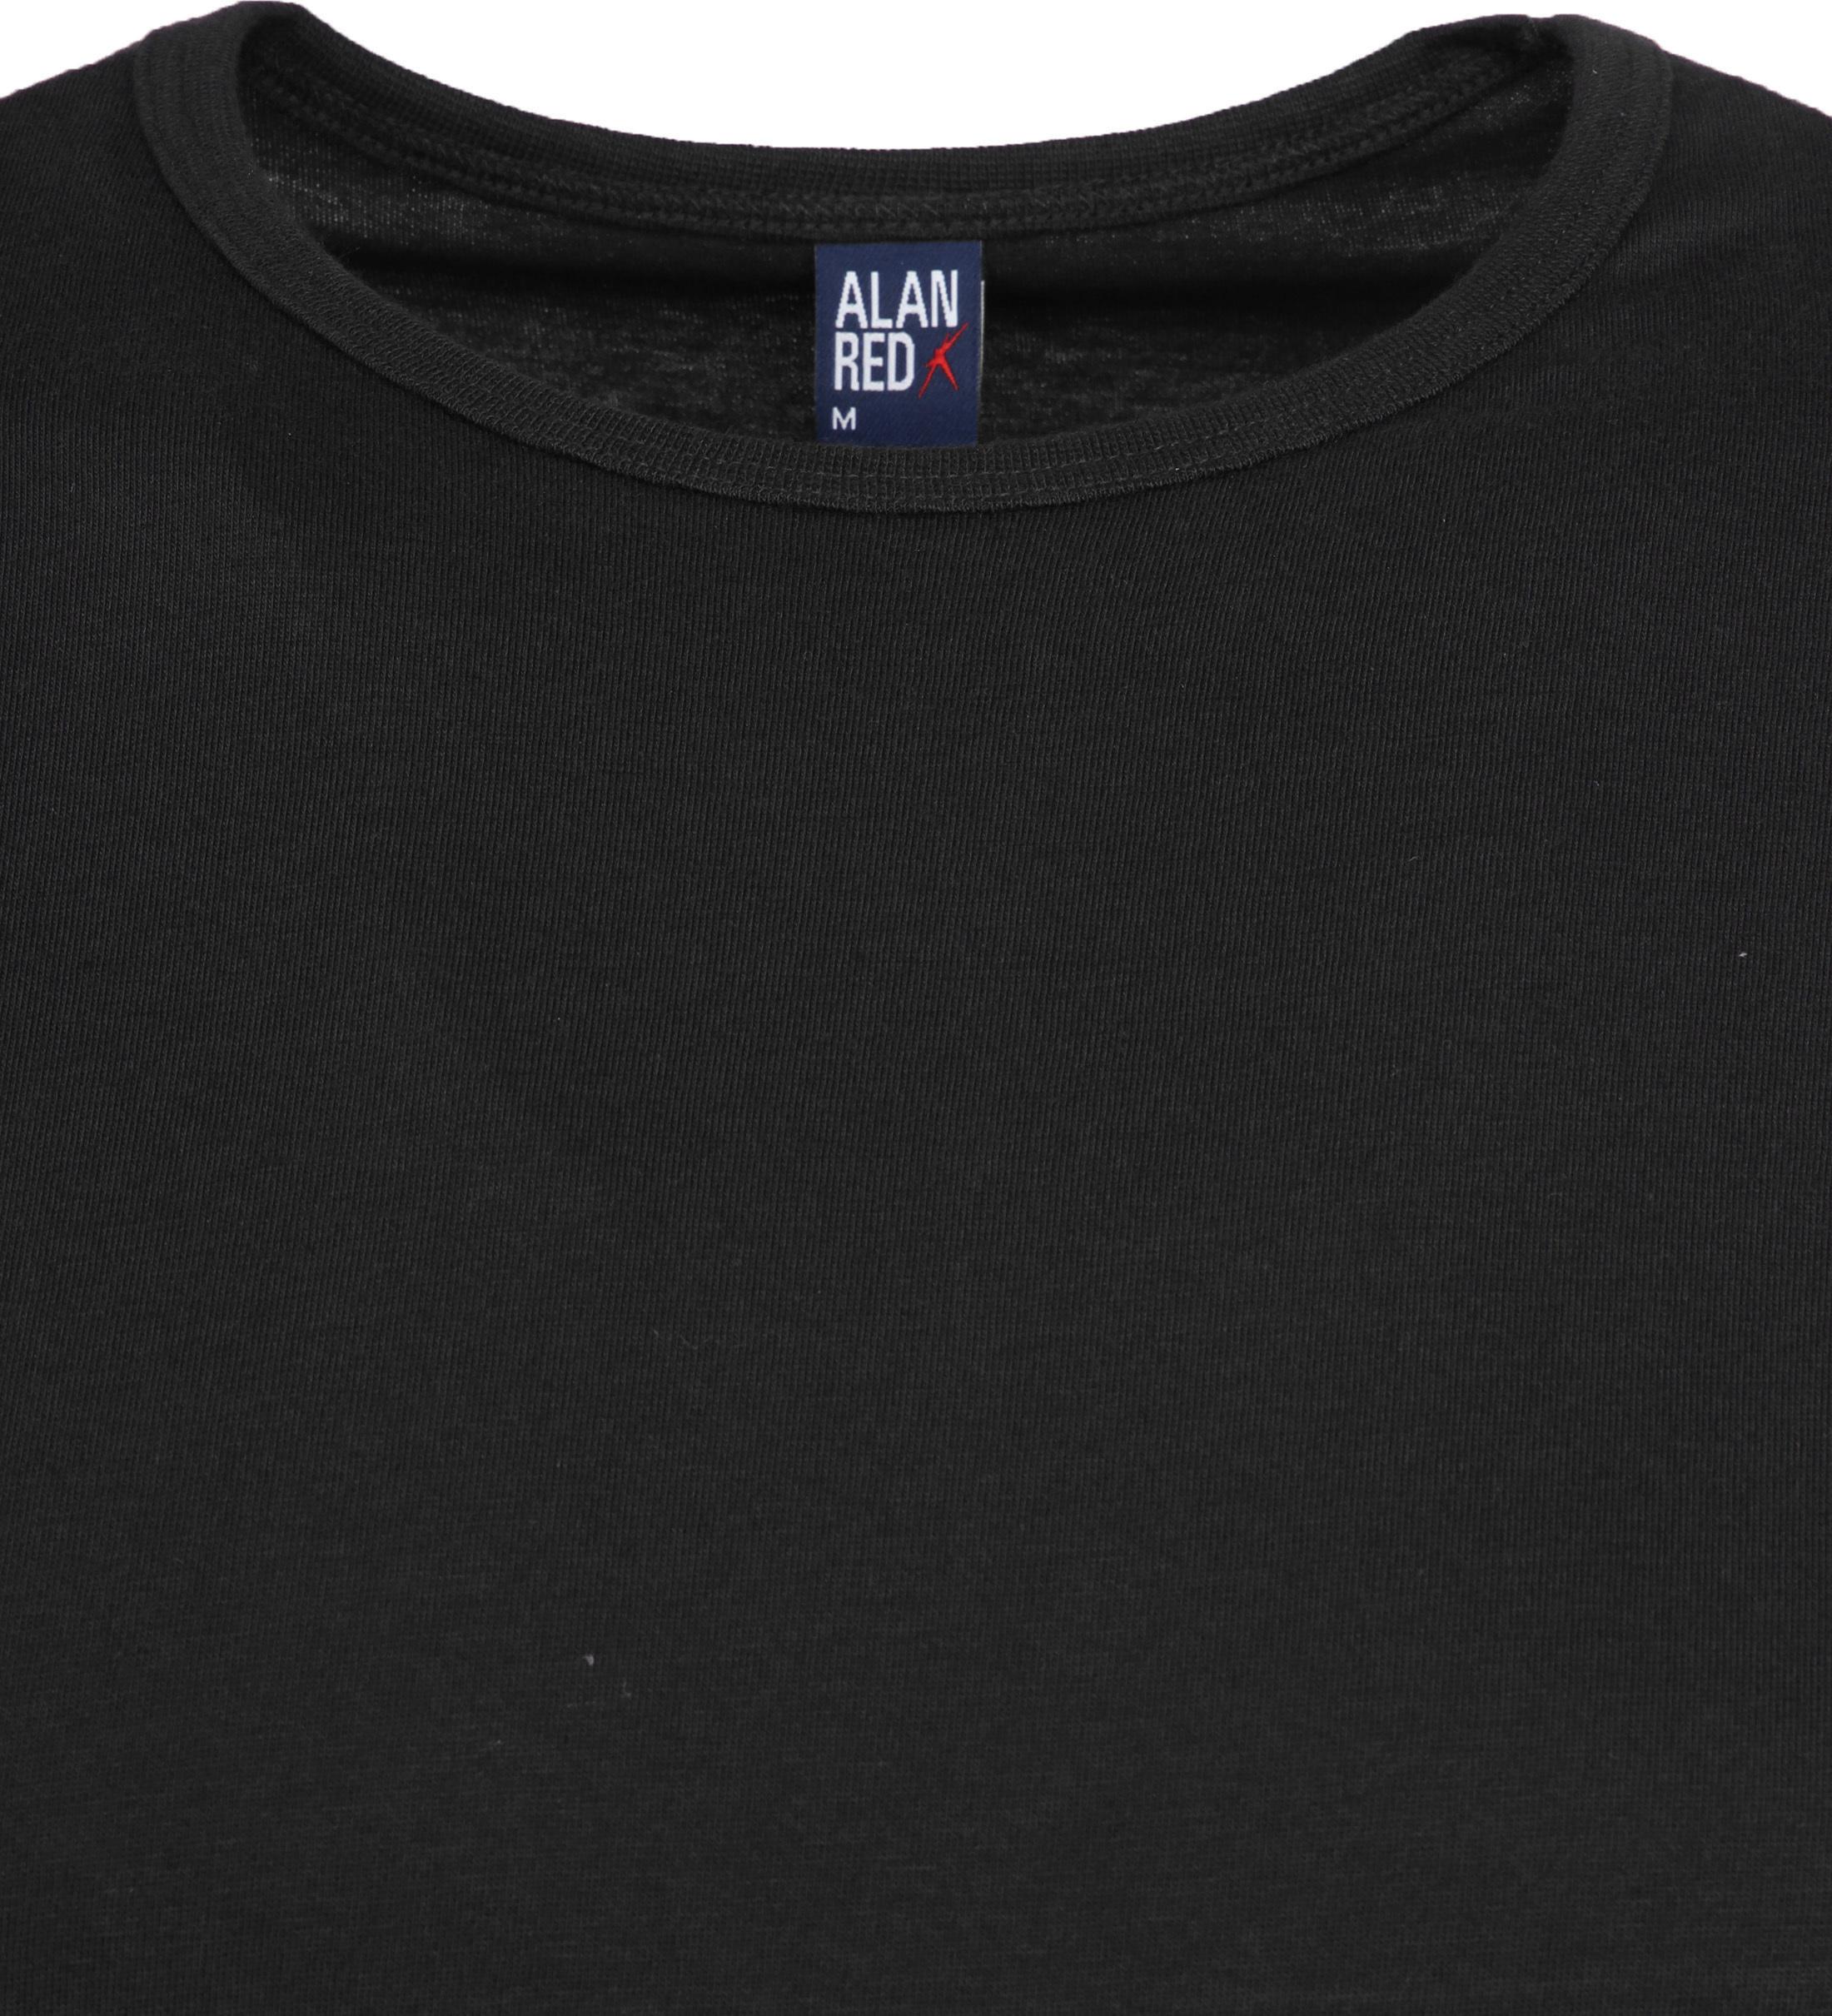 Alan Red Extra Lang T-Shirts Derby Schwarz (1 Pack) foto 1